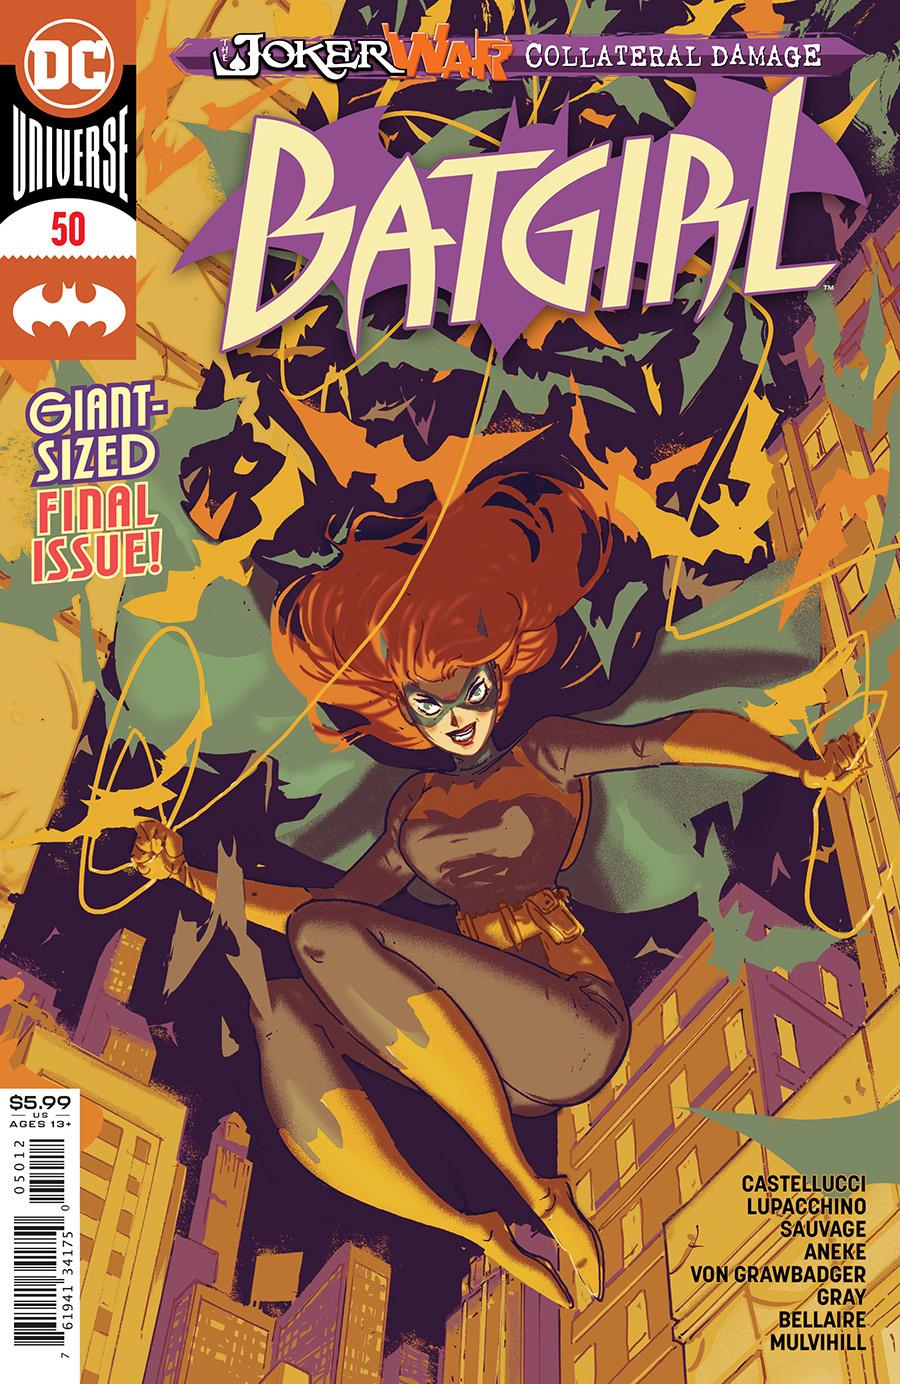 Batgirl Vol 5 #50 2nd Printing Riley Rossmo Variant